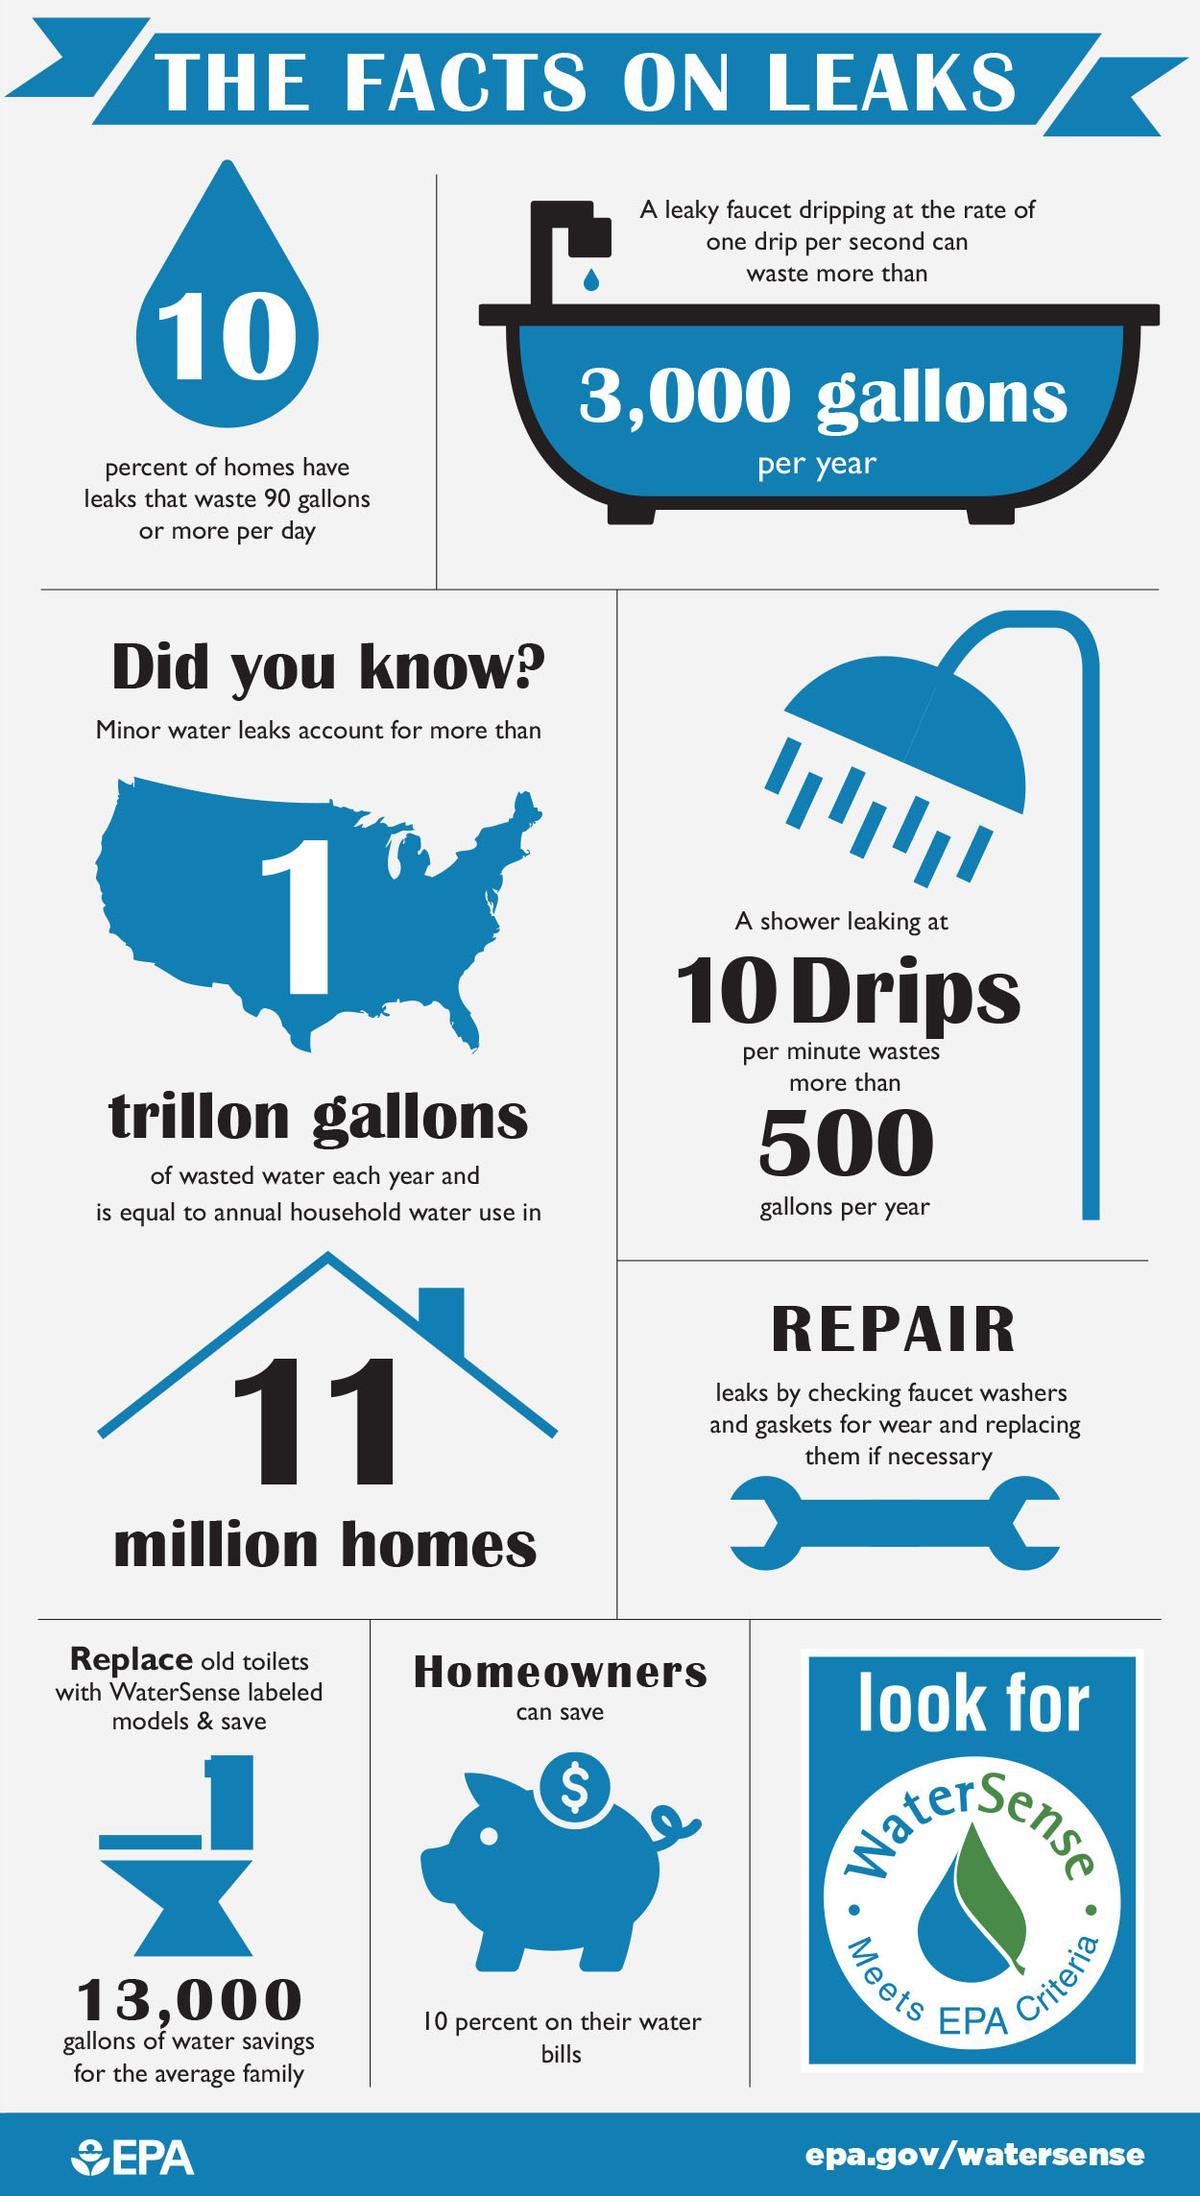 National Fix-a-Leak Week Mar 14 through March 20.